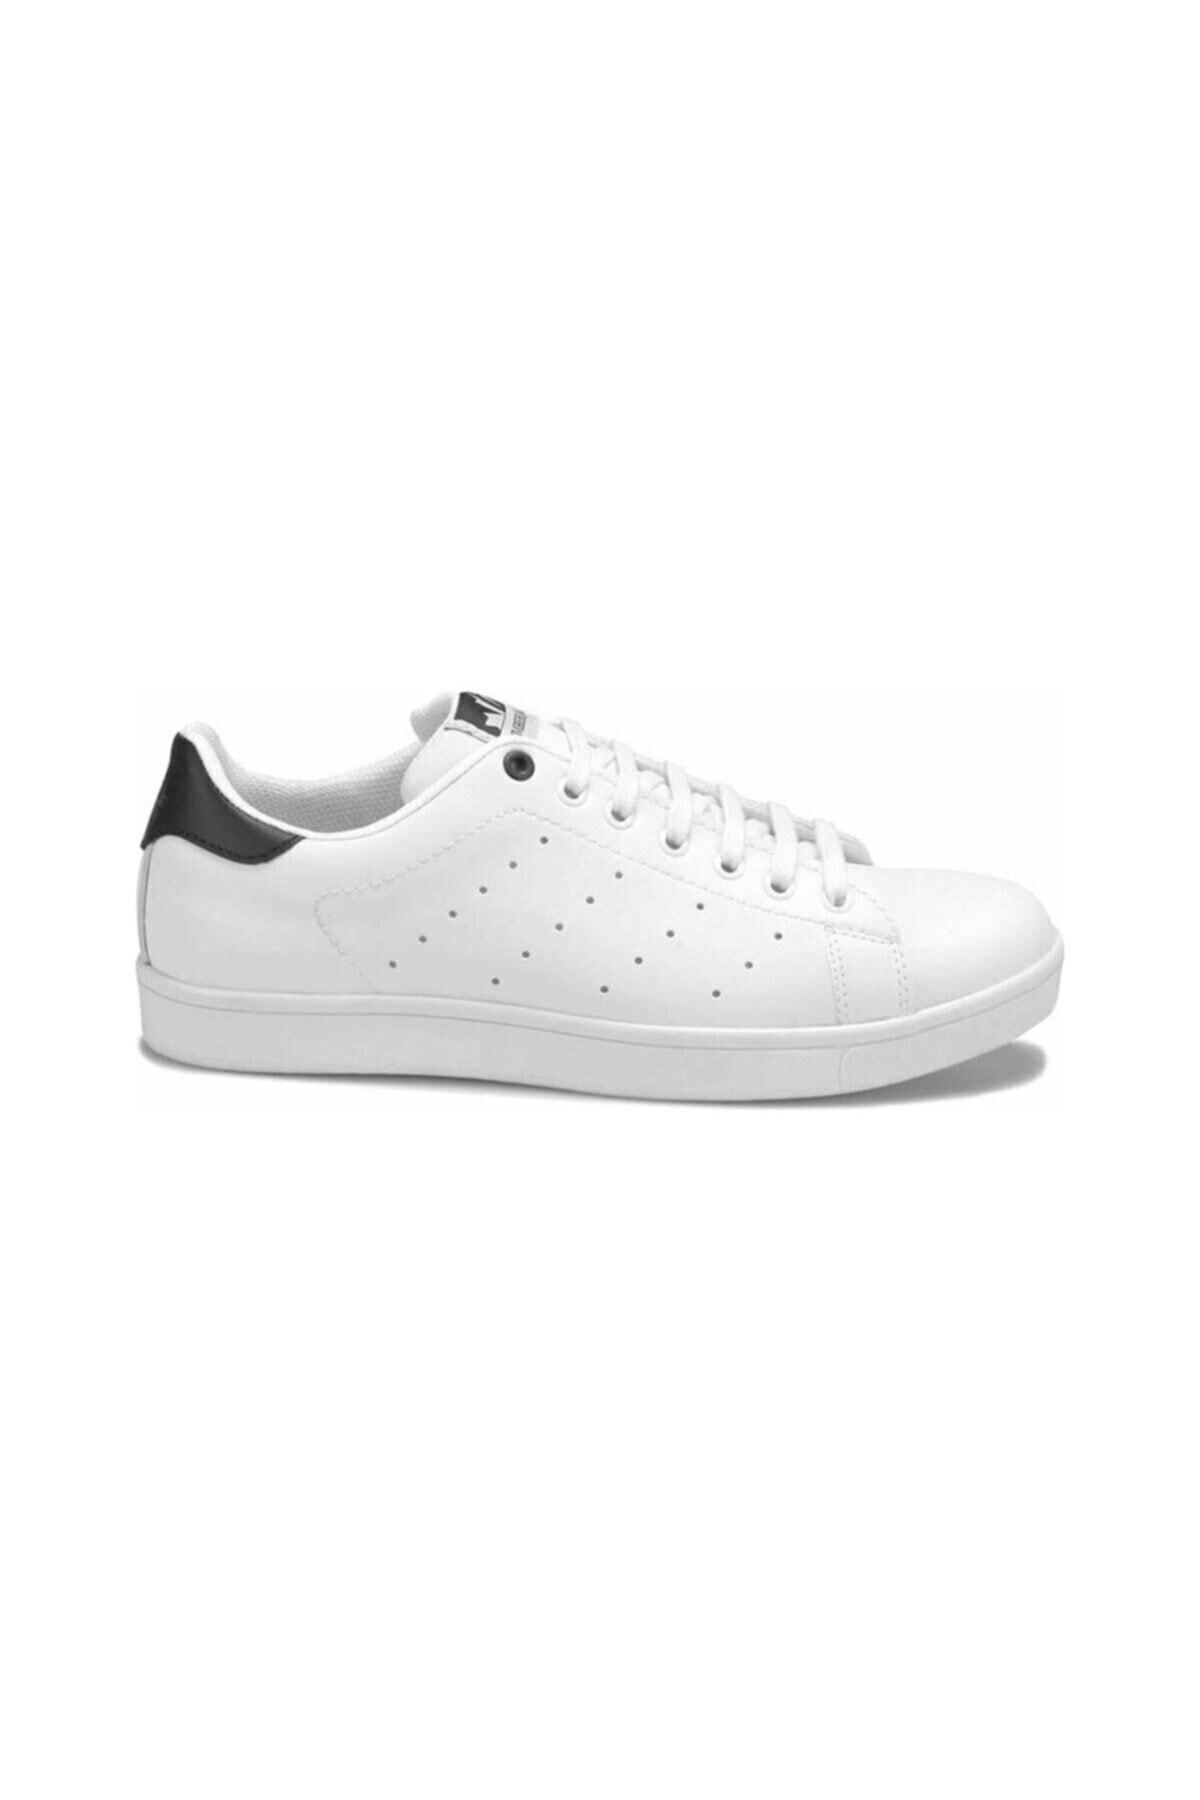 lumberjack GRAZZI 1FX Beyaz Erkek Sneaker Ayakkabı 100785186 2